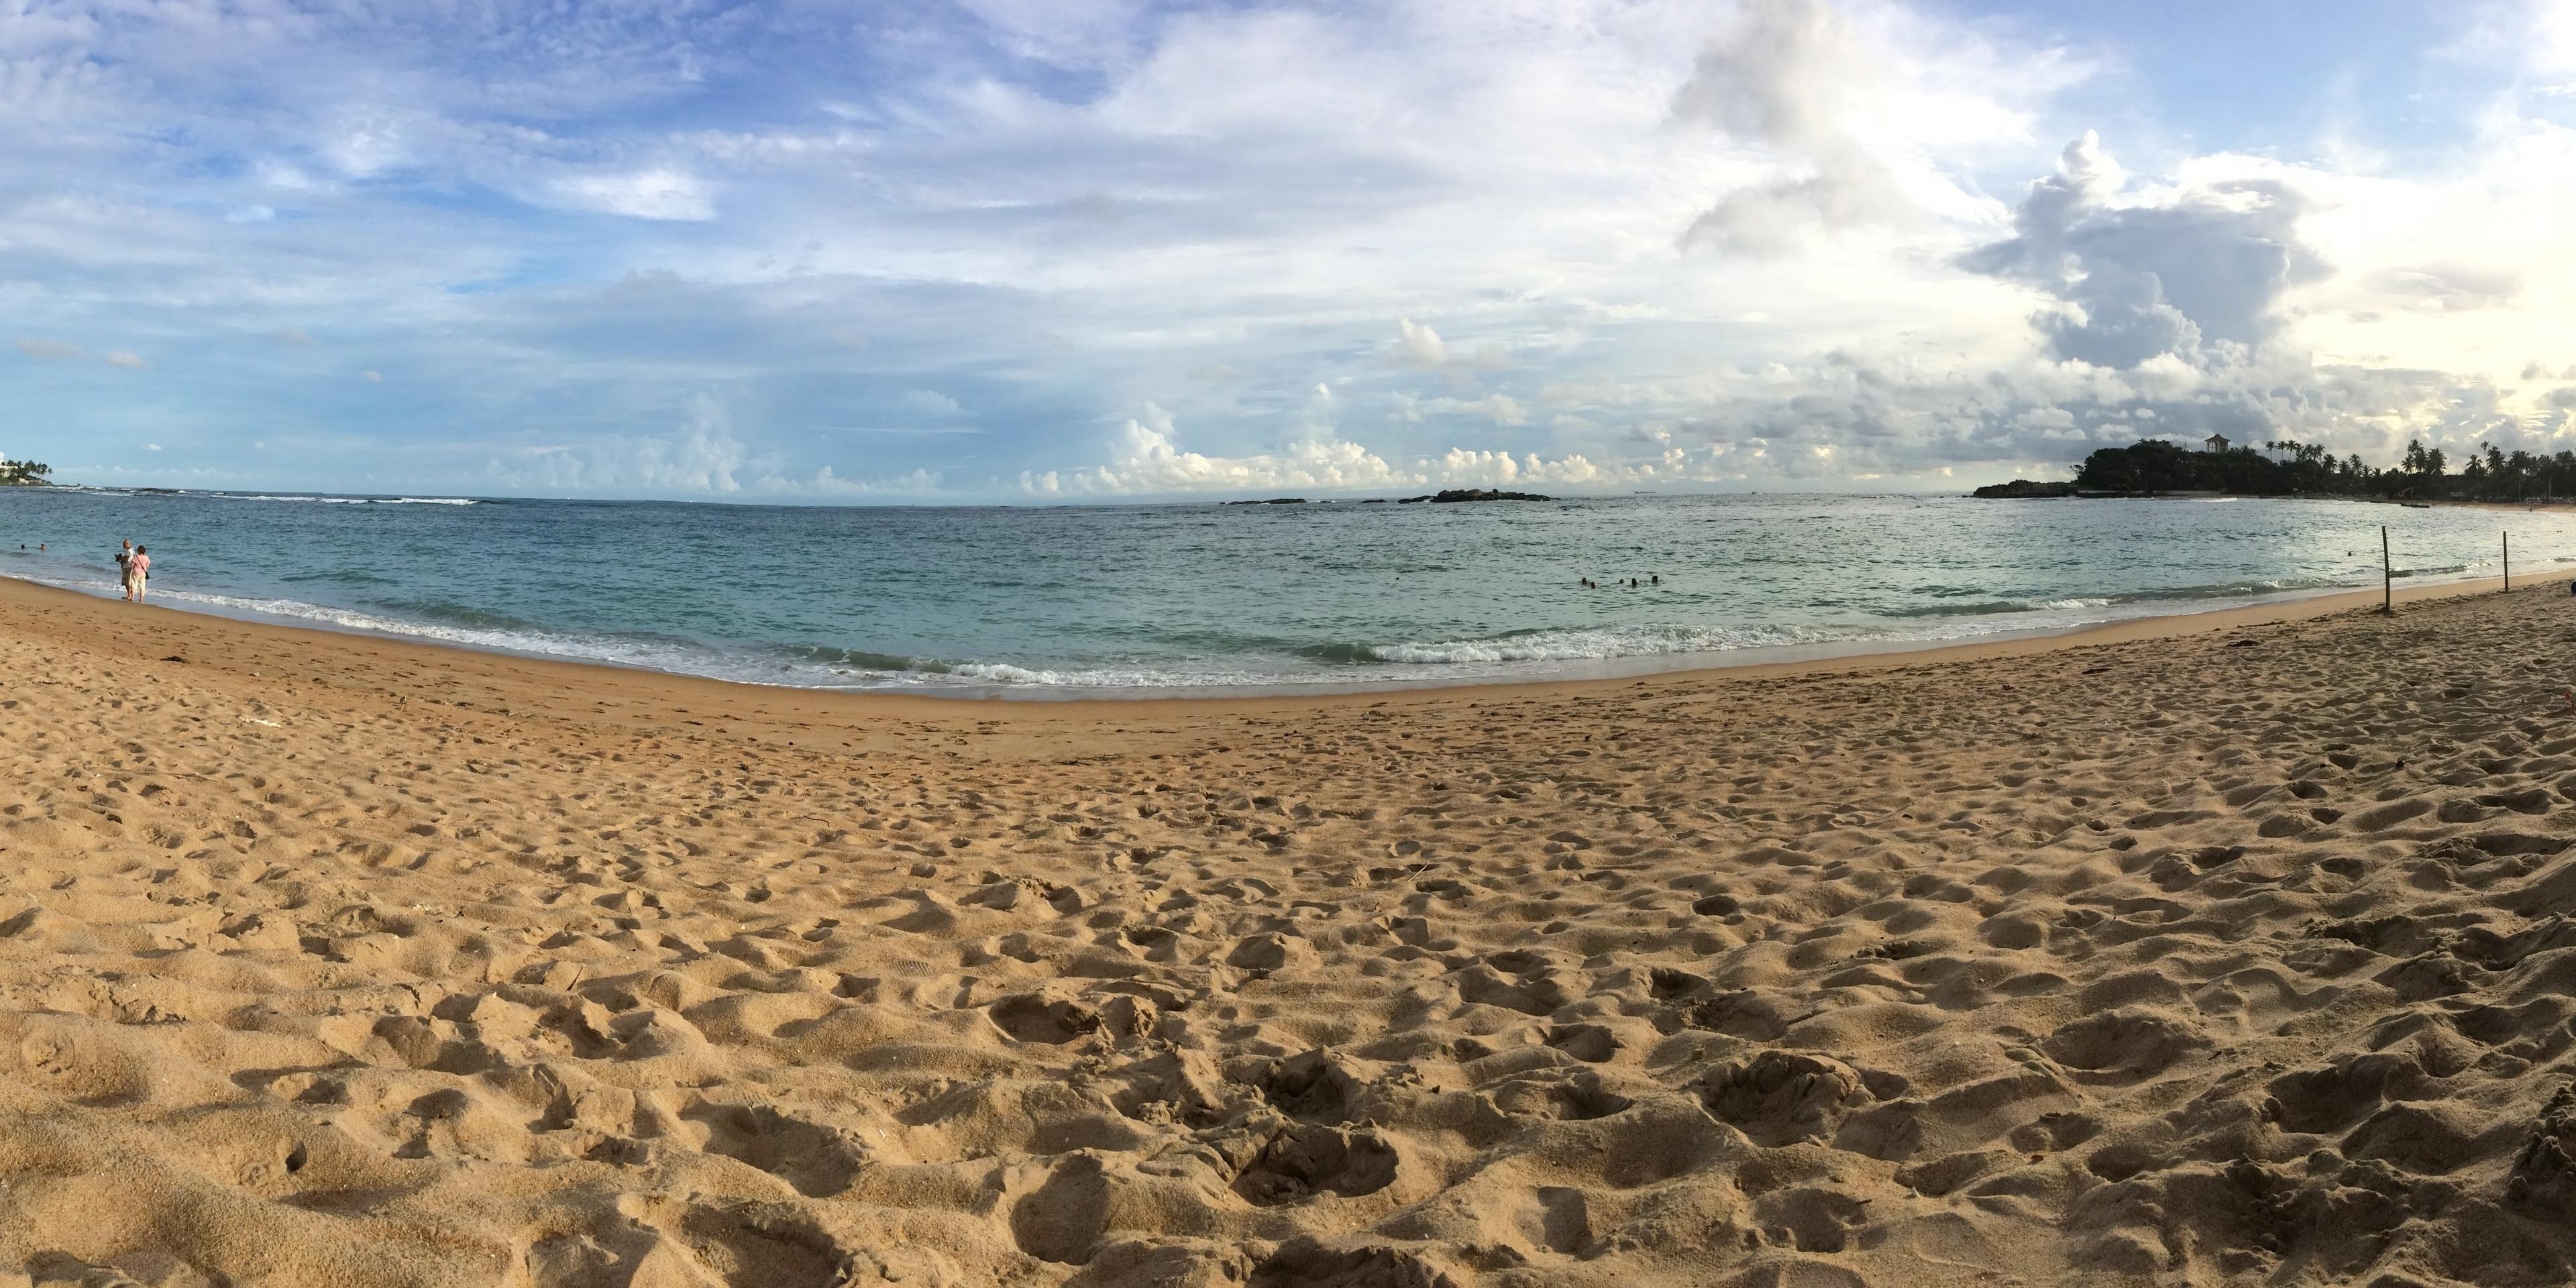 Unawatuna, Southern Province, Sri Lanka